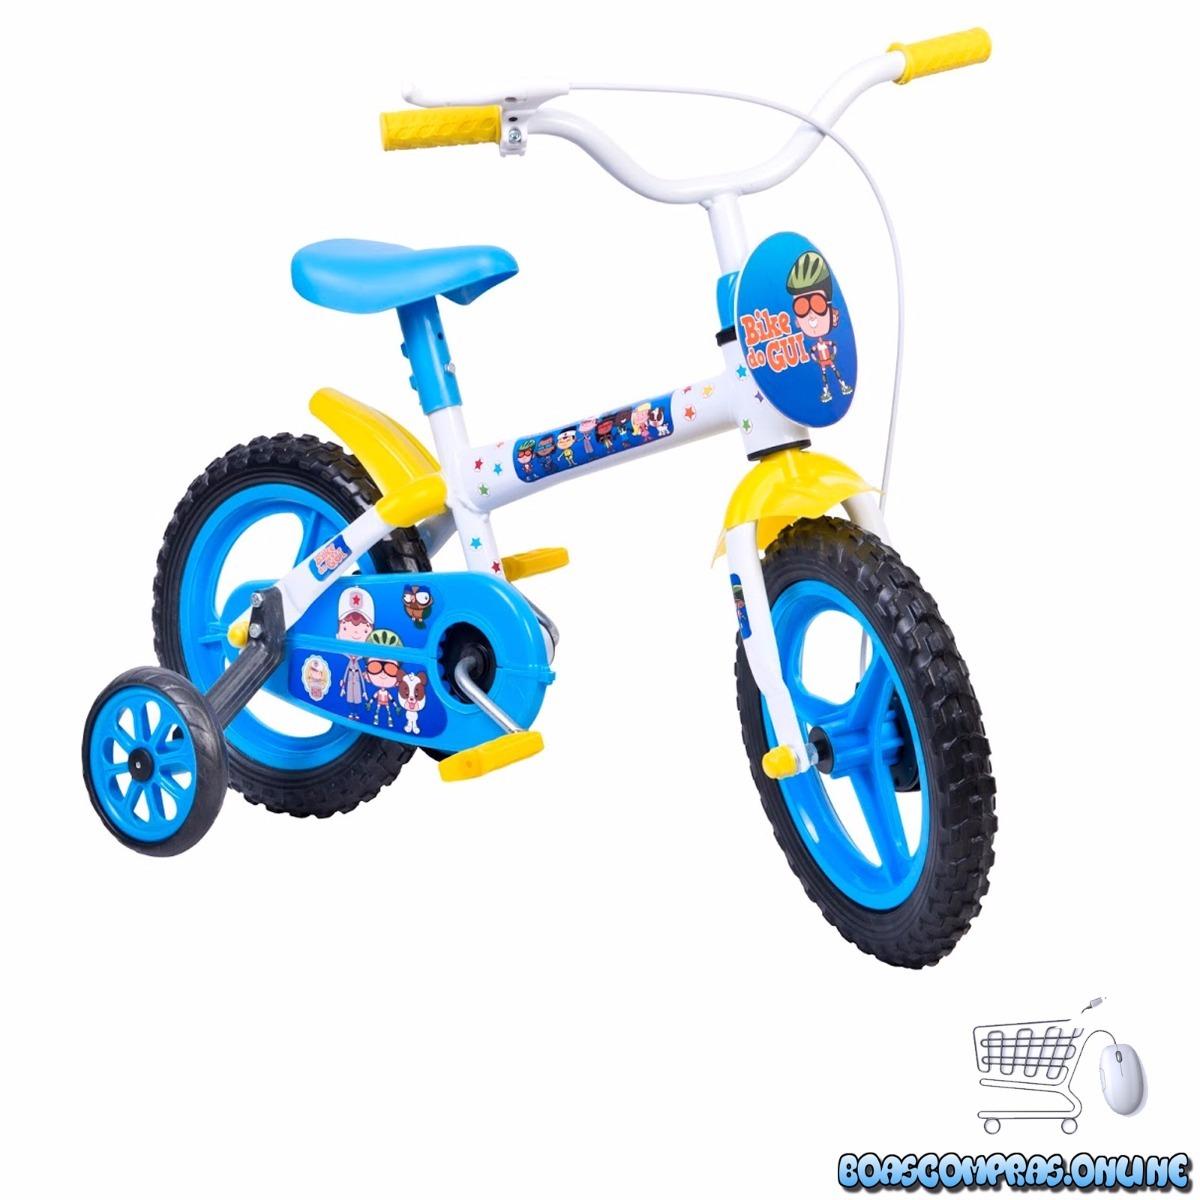 36ea6ca4b bicicleta infantil aro 12 clubinho salva vidas - styll baby. Carregando  zoom.